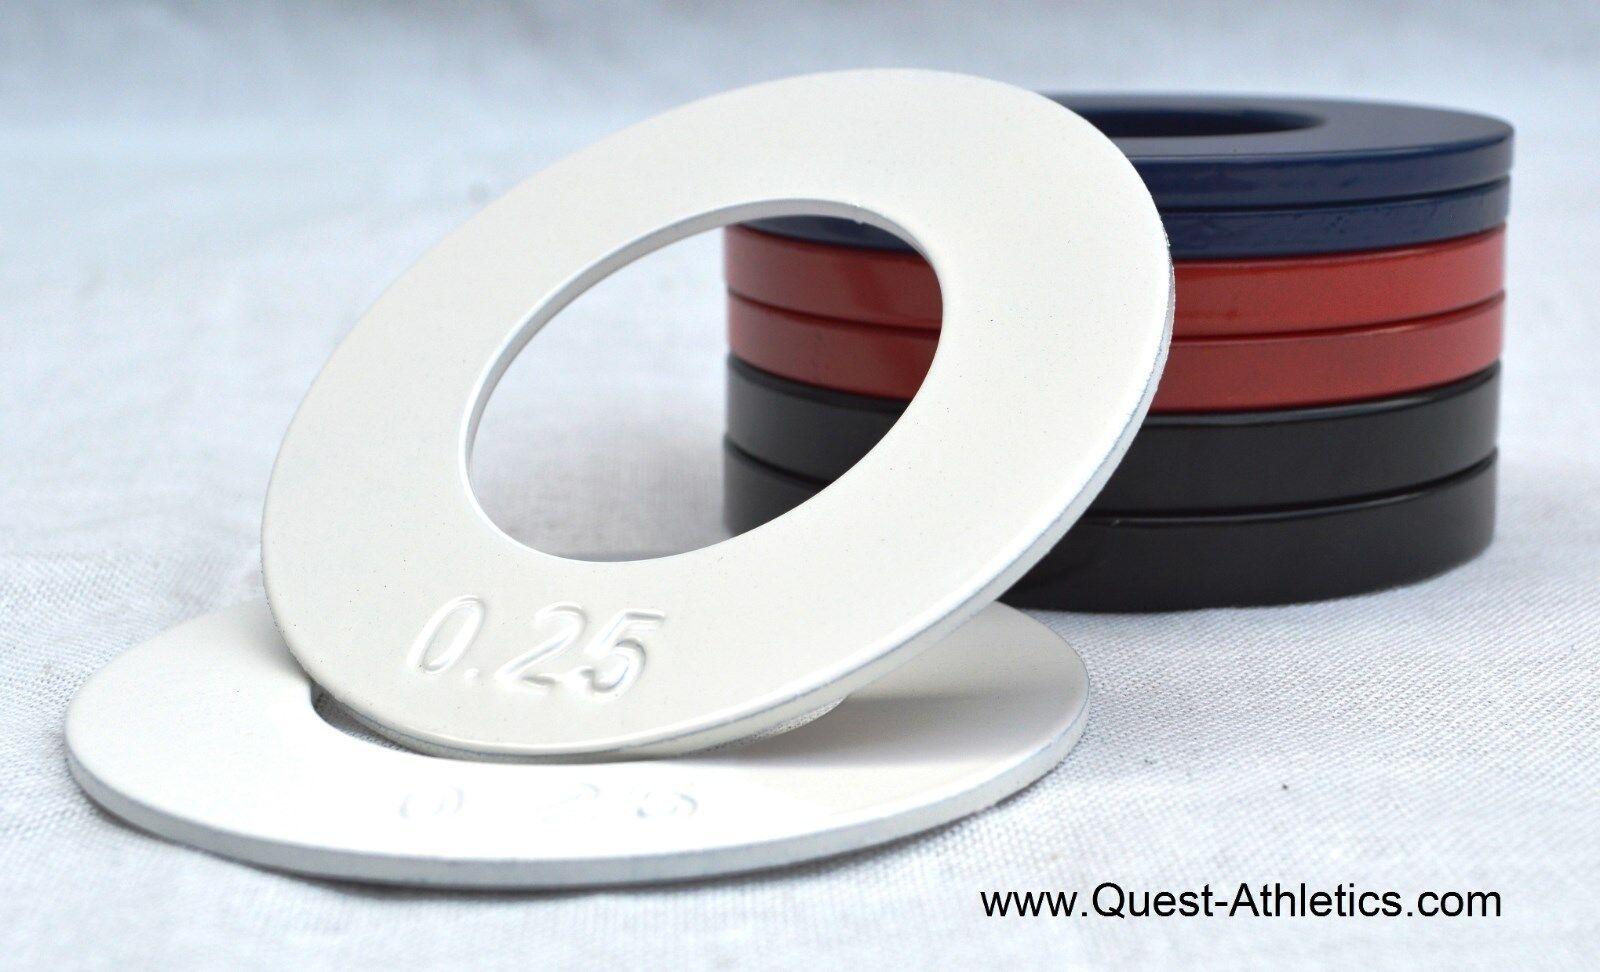 Quest 2 Olympic Fraktional Plate Set - 0.25 Lb, 0.5 Lb, 0.75 Lb, 1.0 Lb Plates